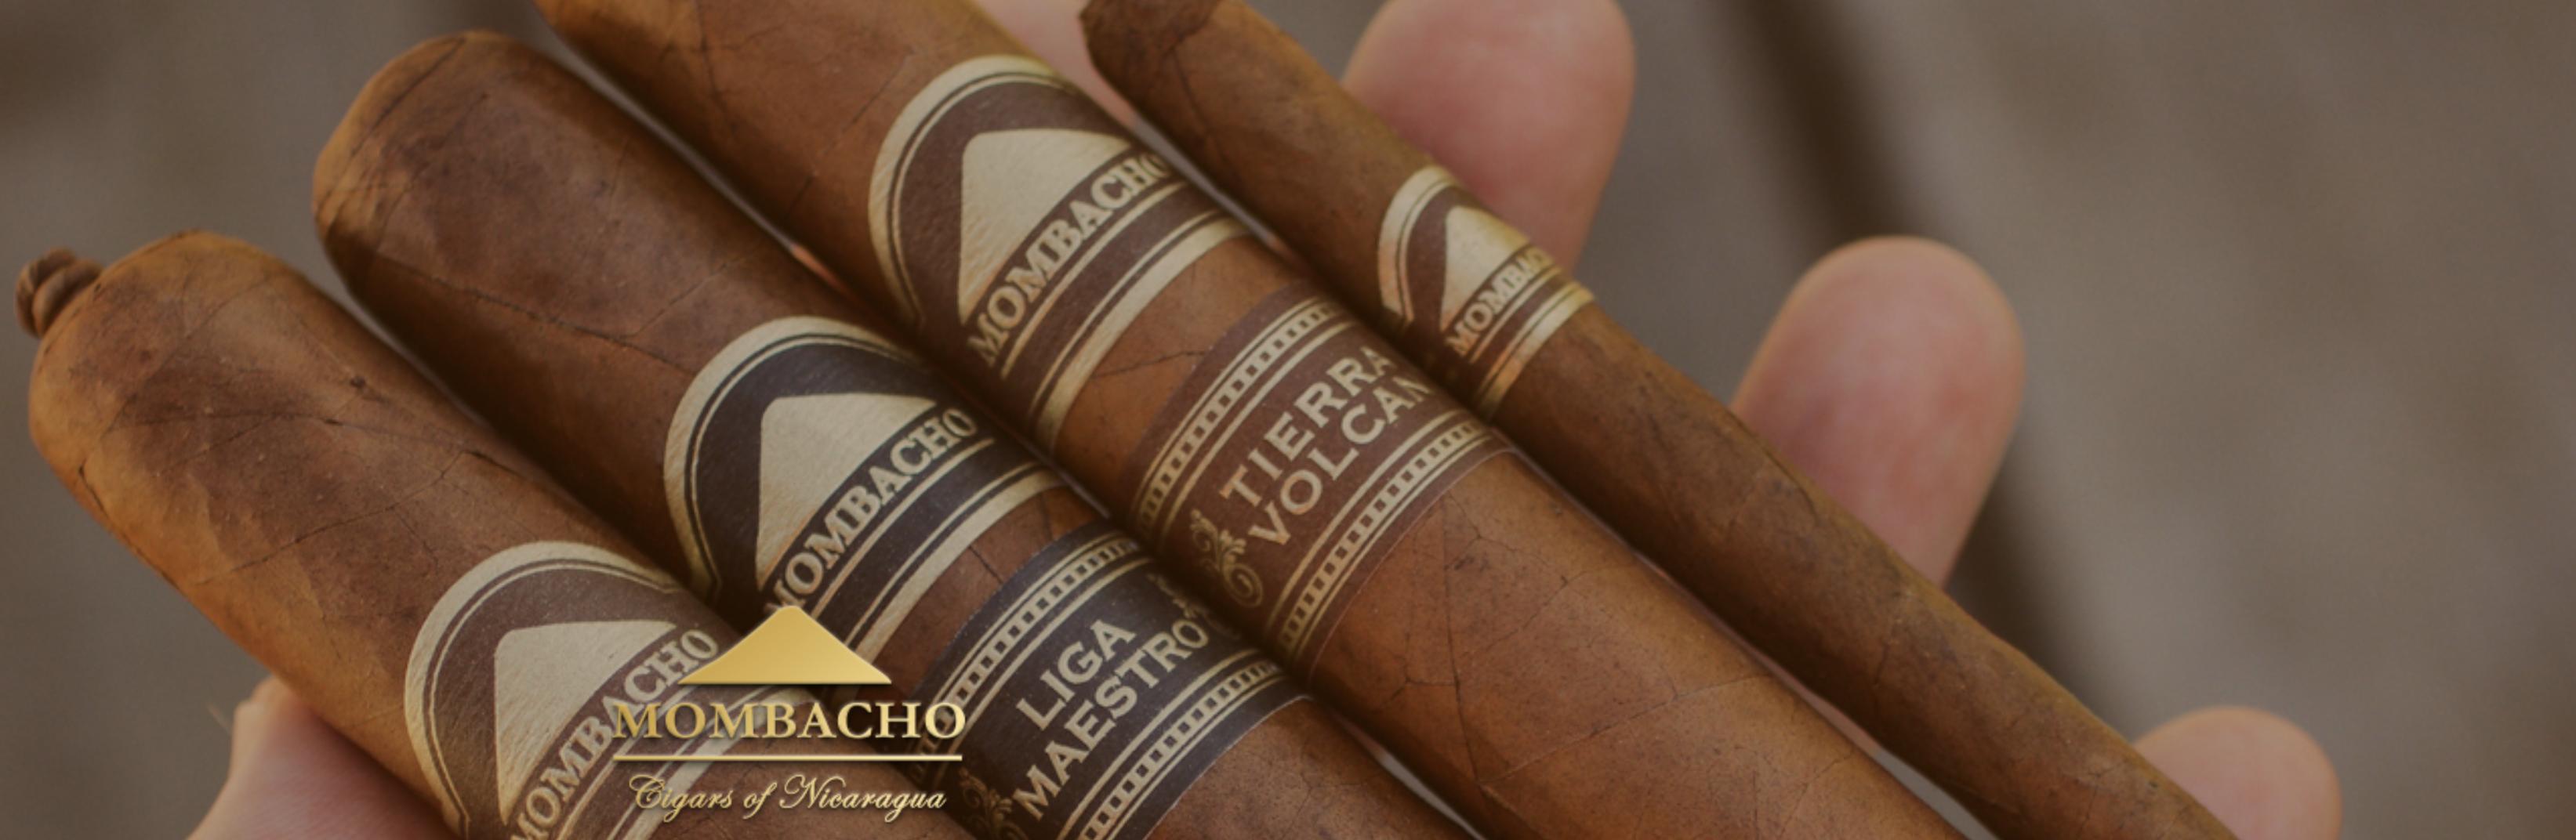 Mombacho Cigars Screen Shot